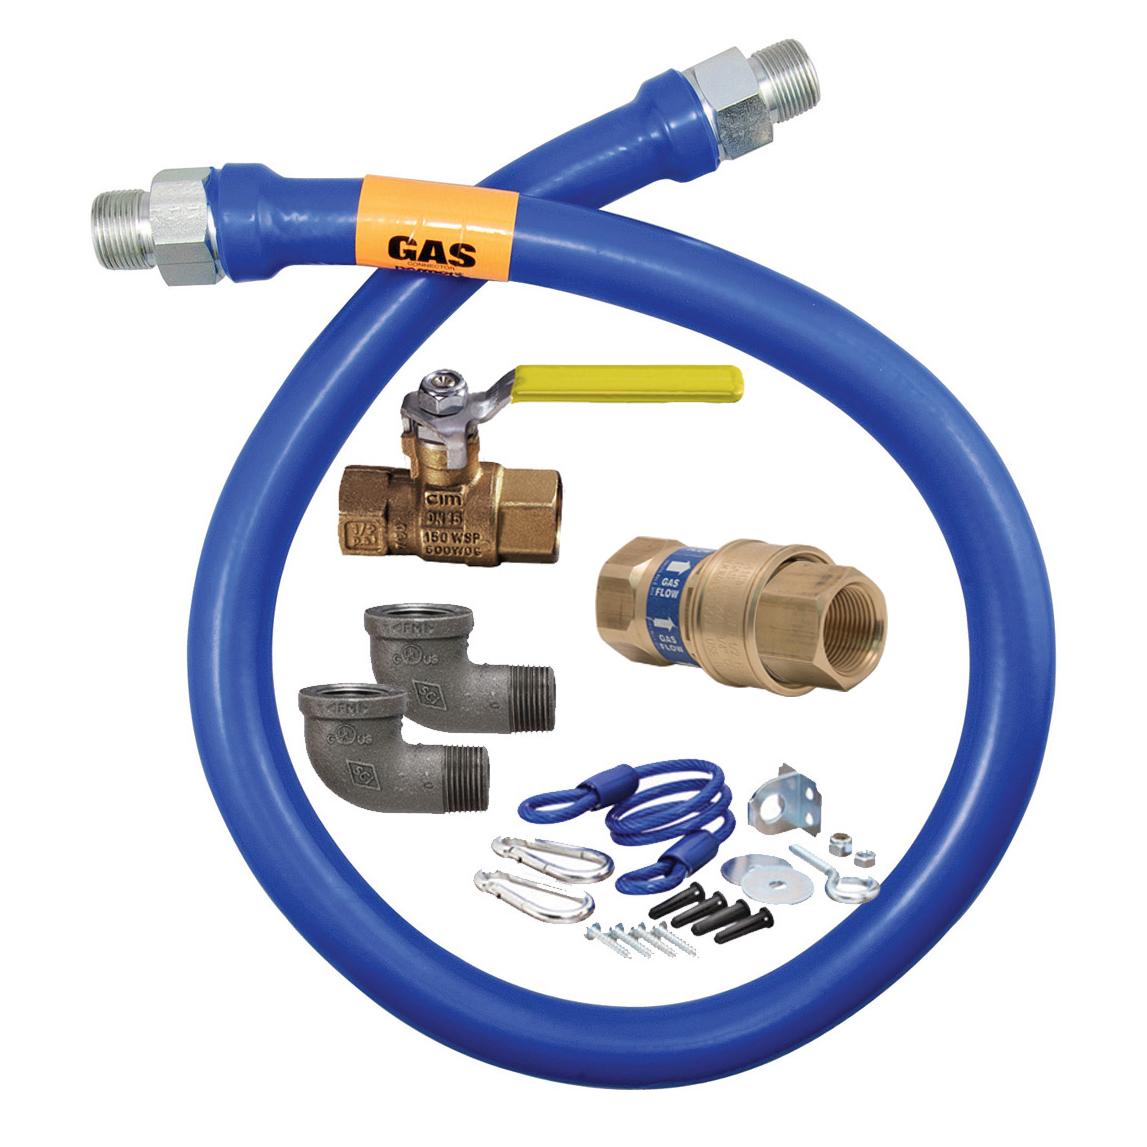 Dormont Manufacturing 1675KITB2S36 gas connector hose kit